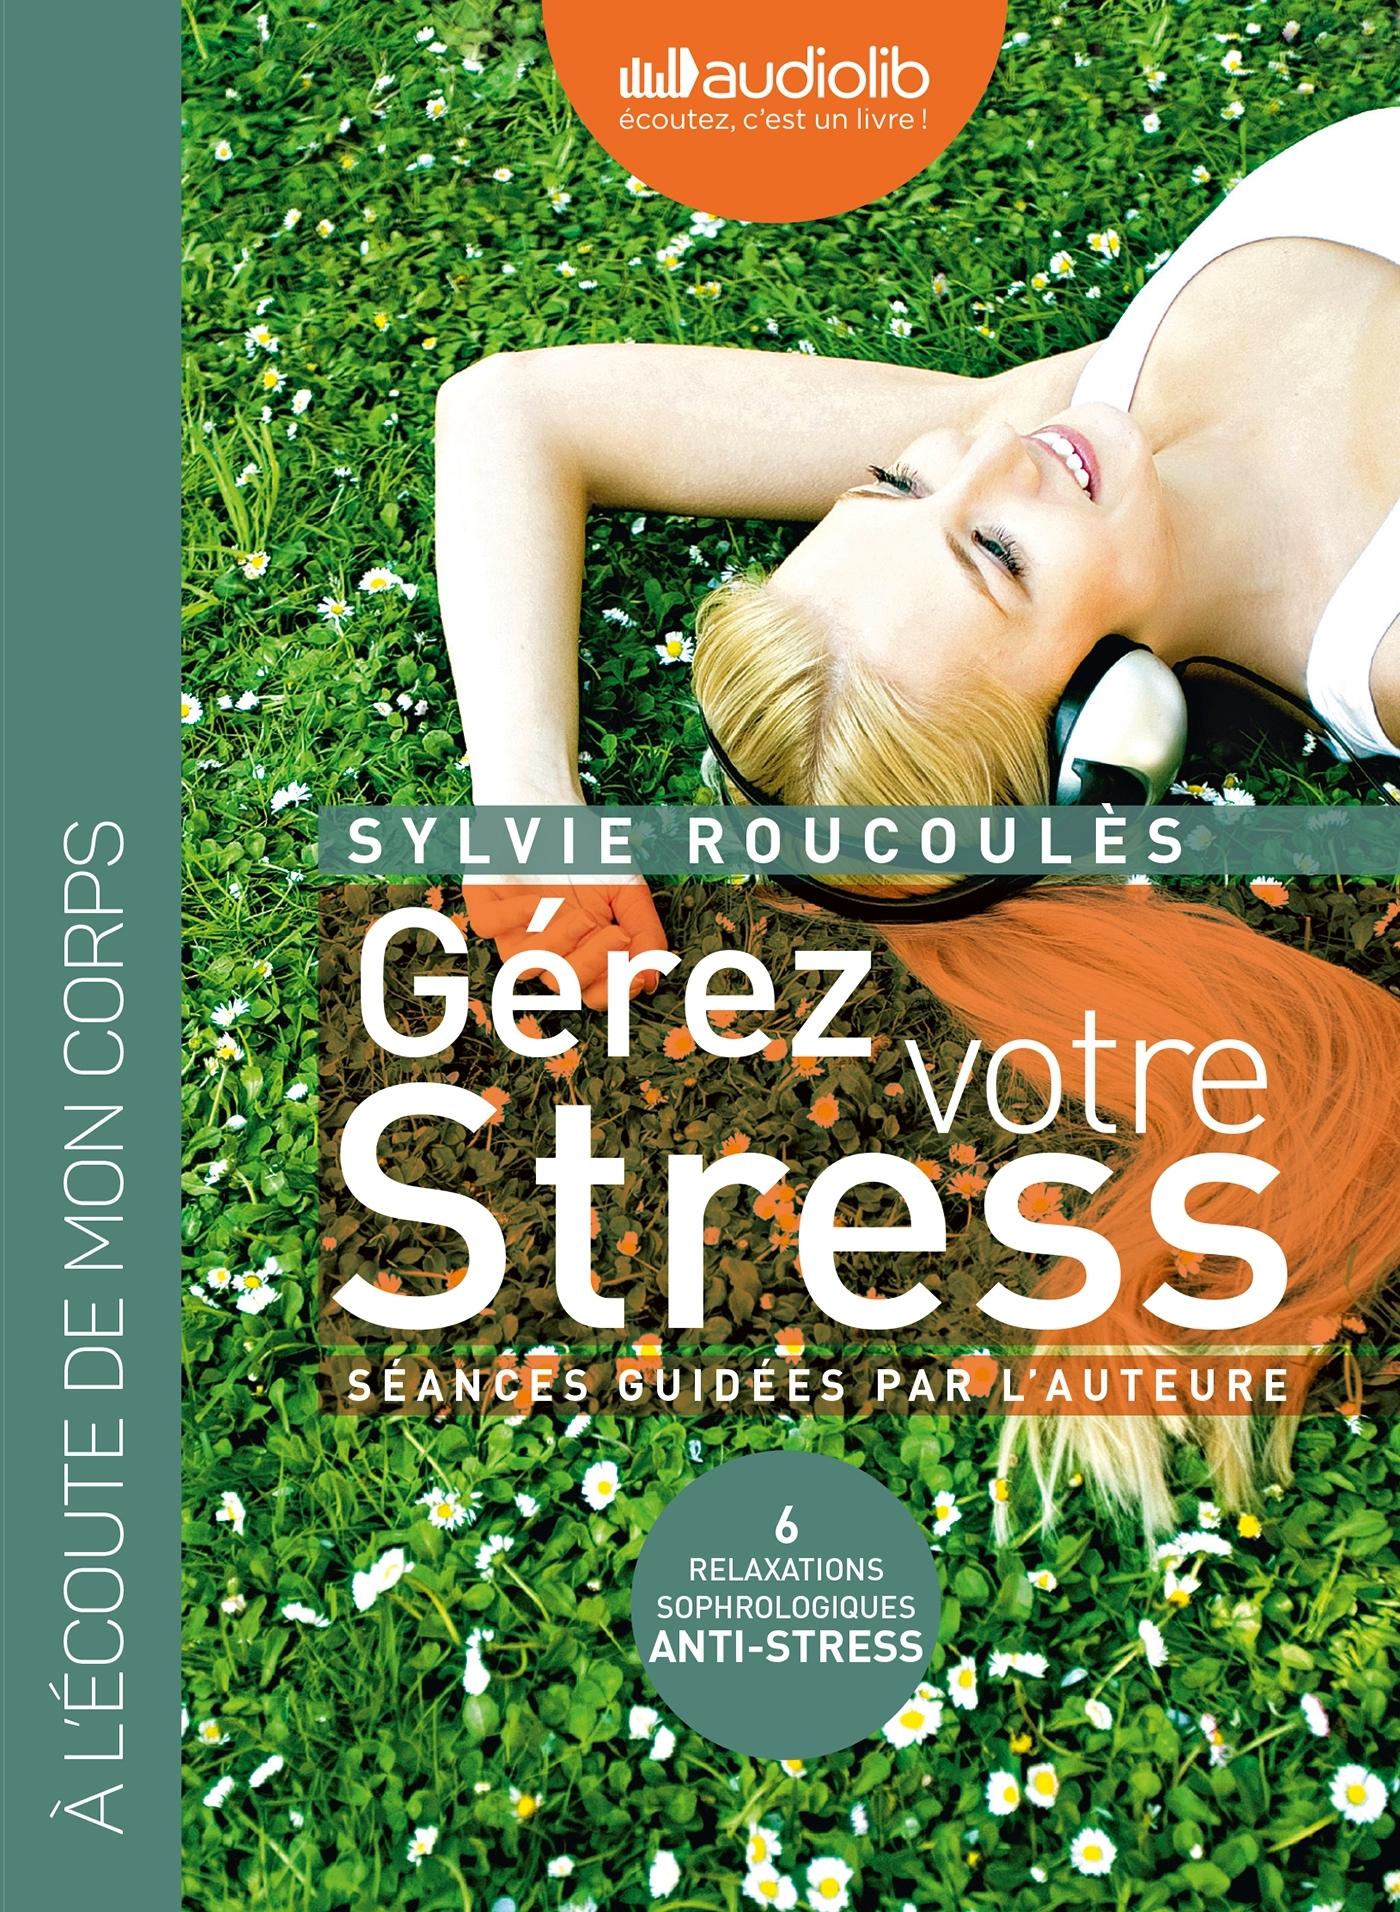 GEREZ VOTRE STRESS - RELAXATIONS SOPHROLOGIQUES ANTI-STRESS